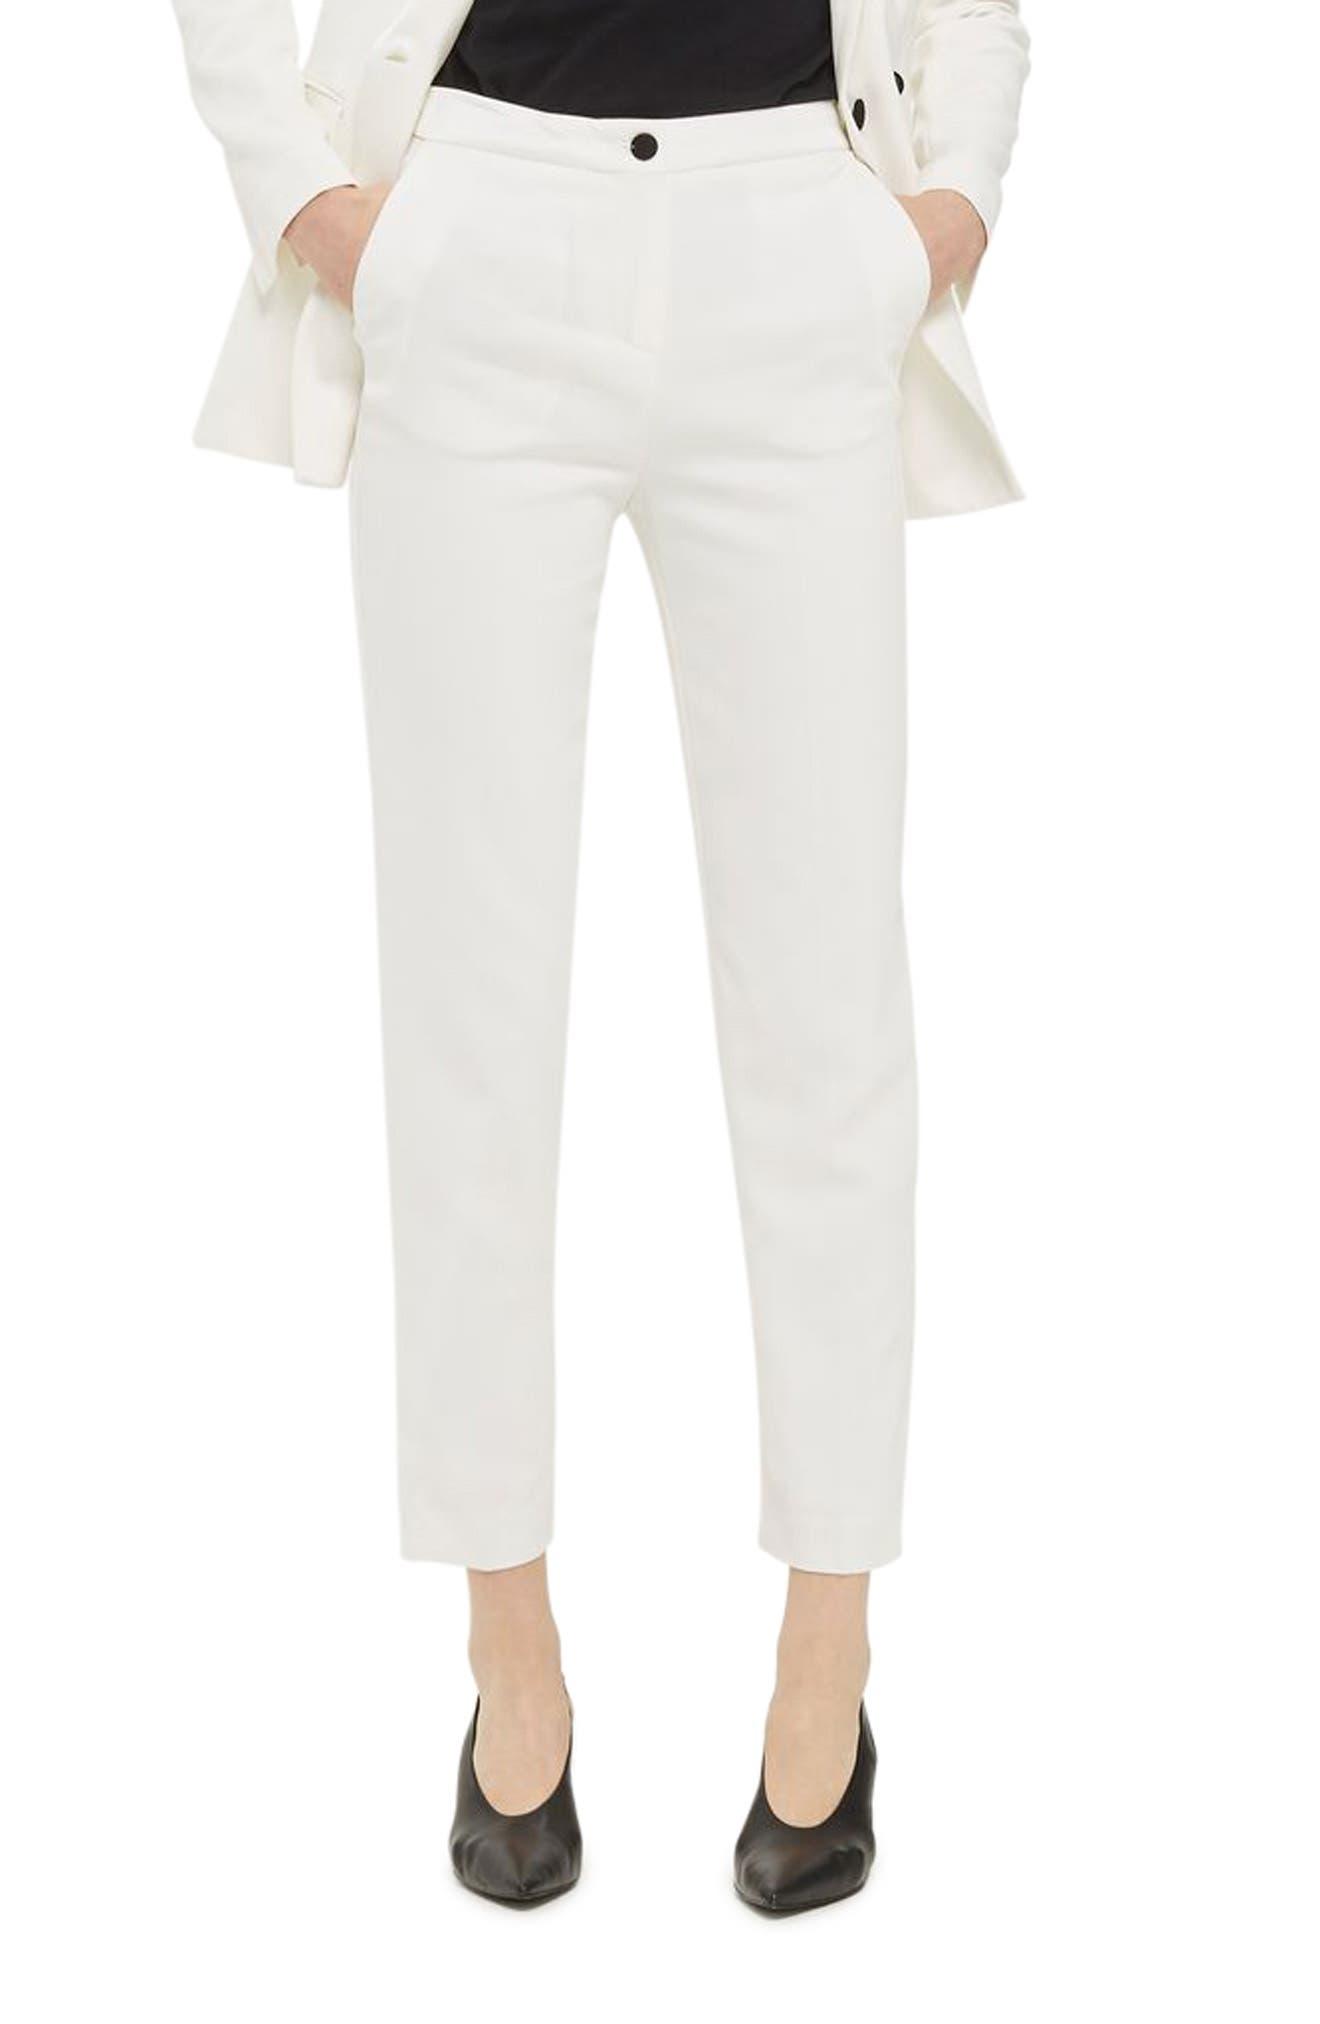 Alternate Image 1 Selected - Topshop Tux Suit Trousers